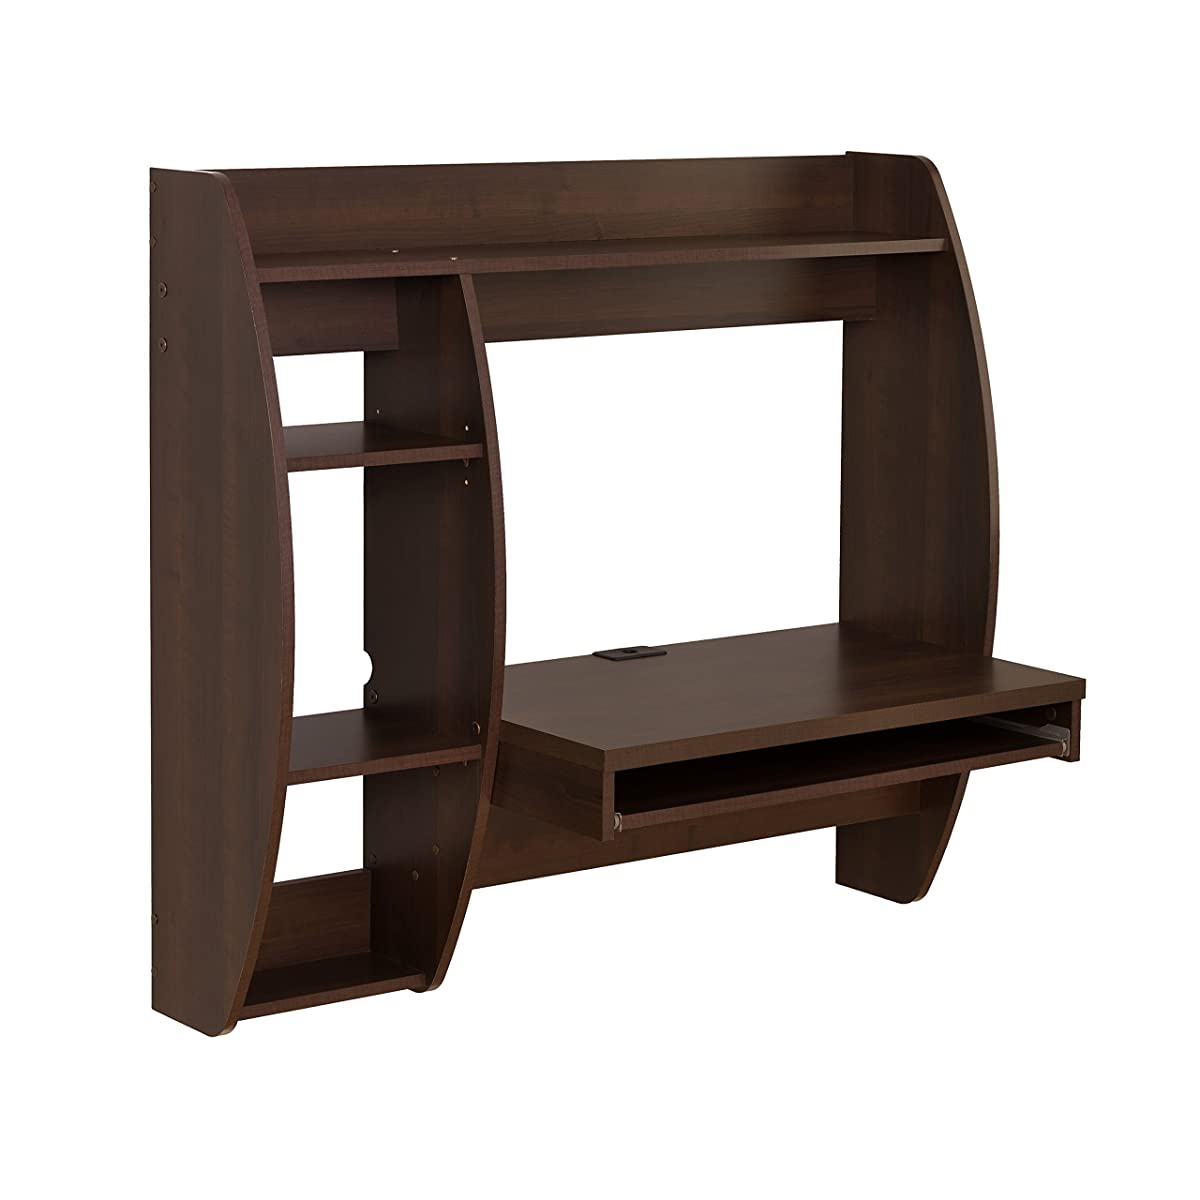 Prepac Floating Desk with Storage and Keyboard Tray, Espresso